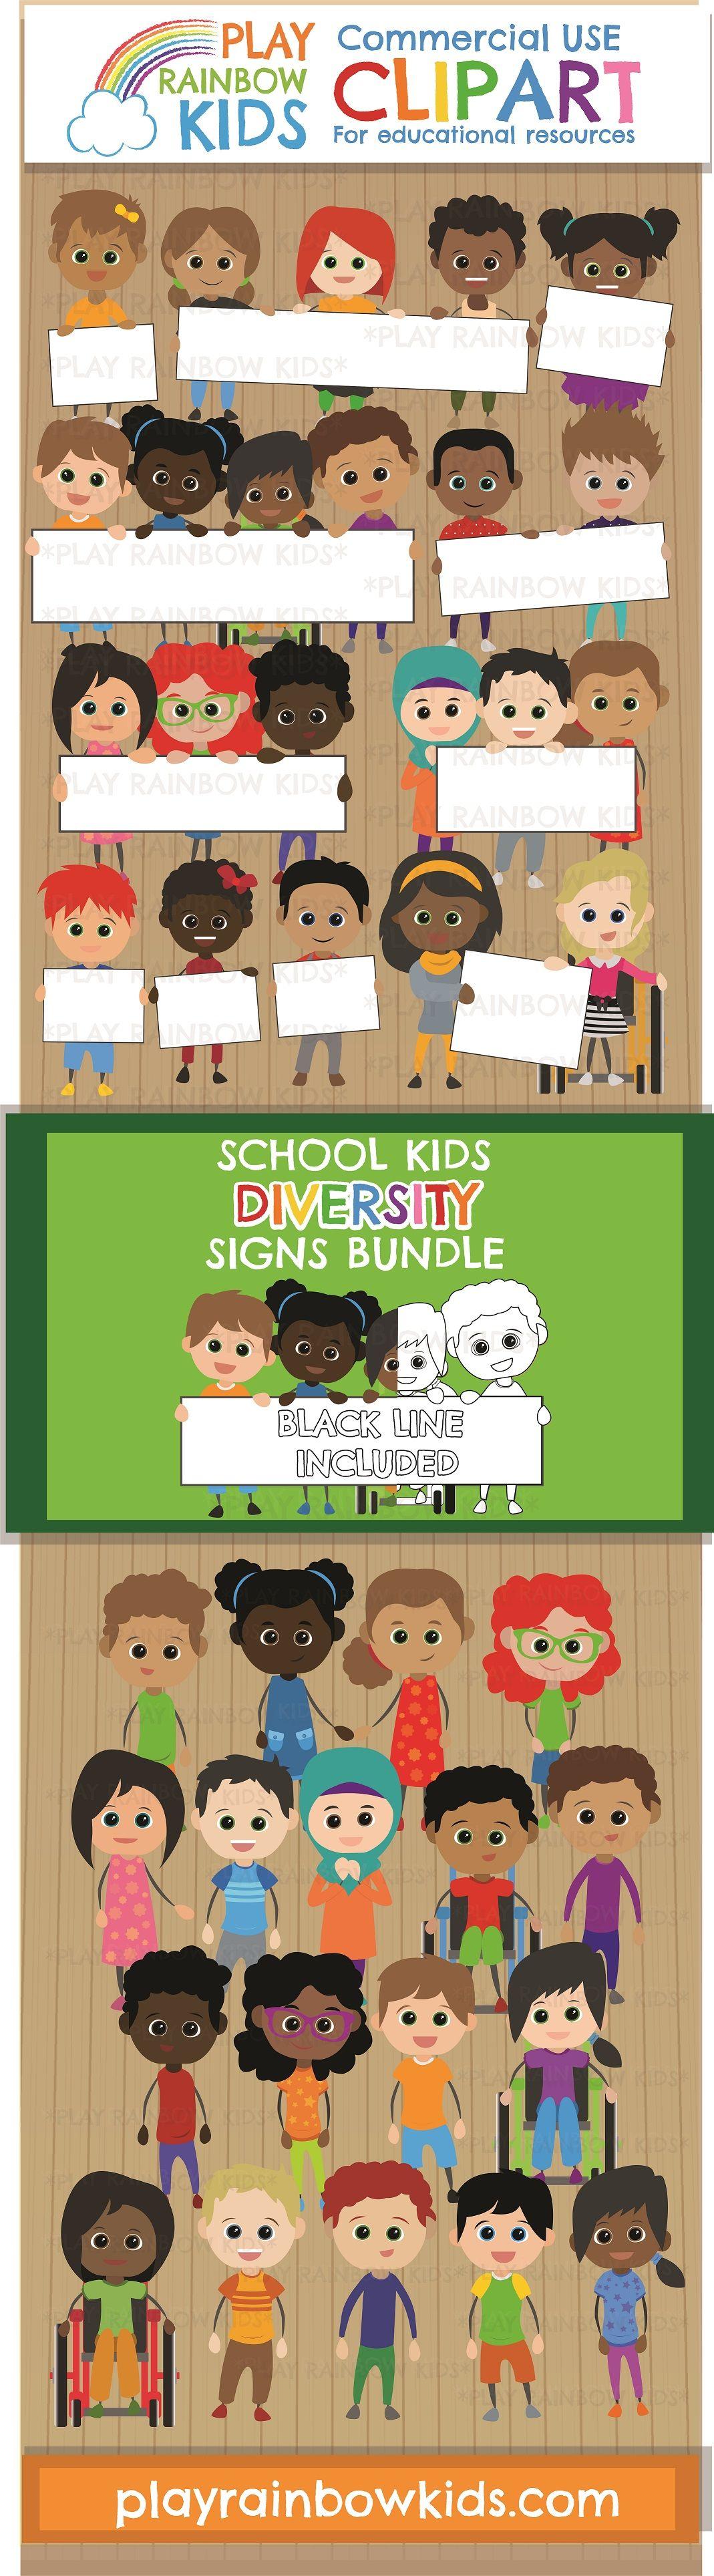 Cute Kids With Signs Clipart For Teachers Kids Clipart Rainbow Kids Clip Art